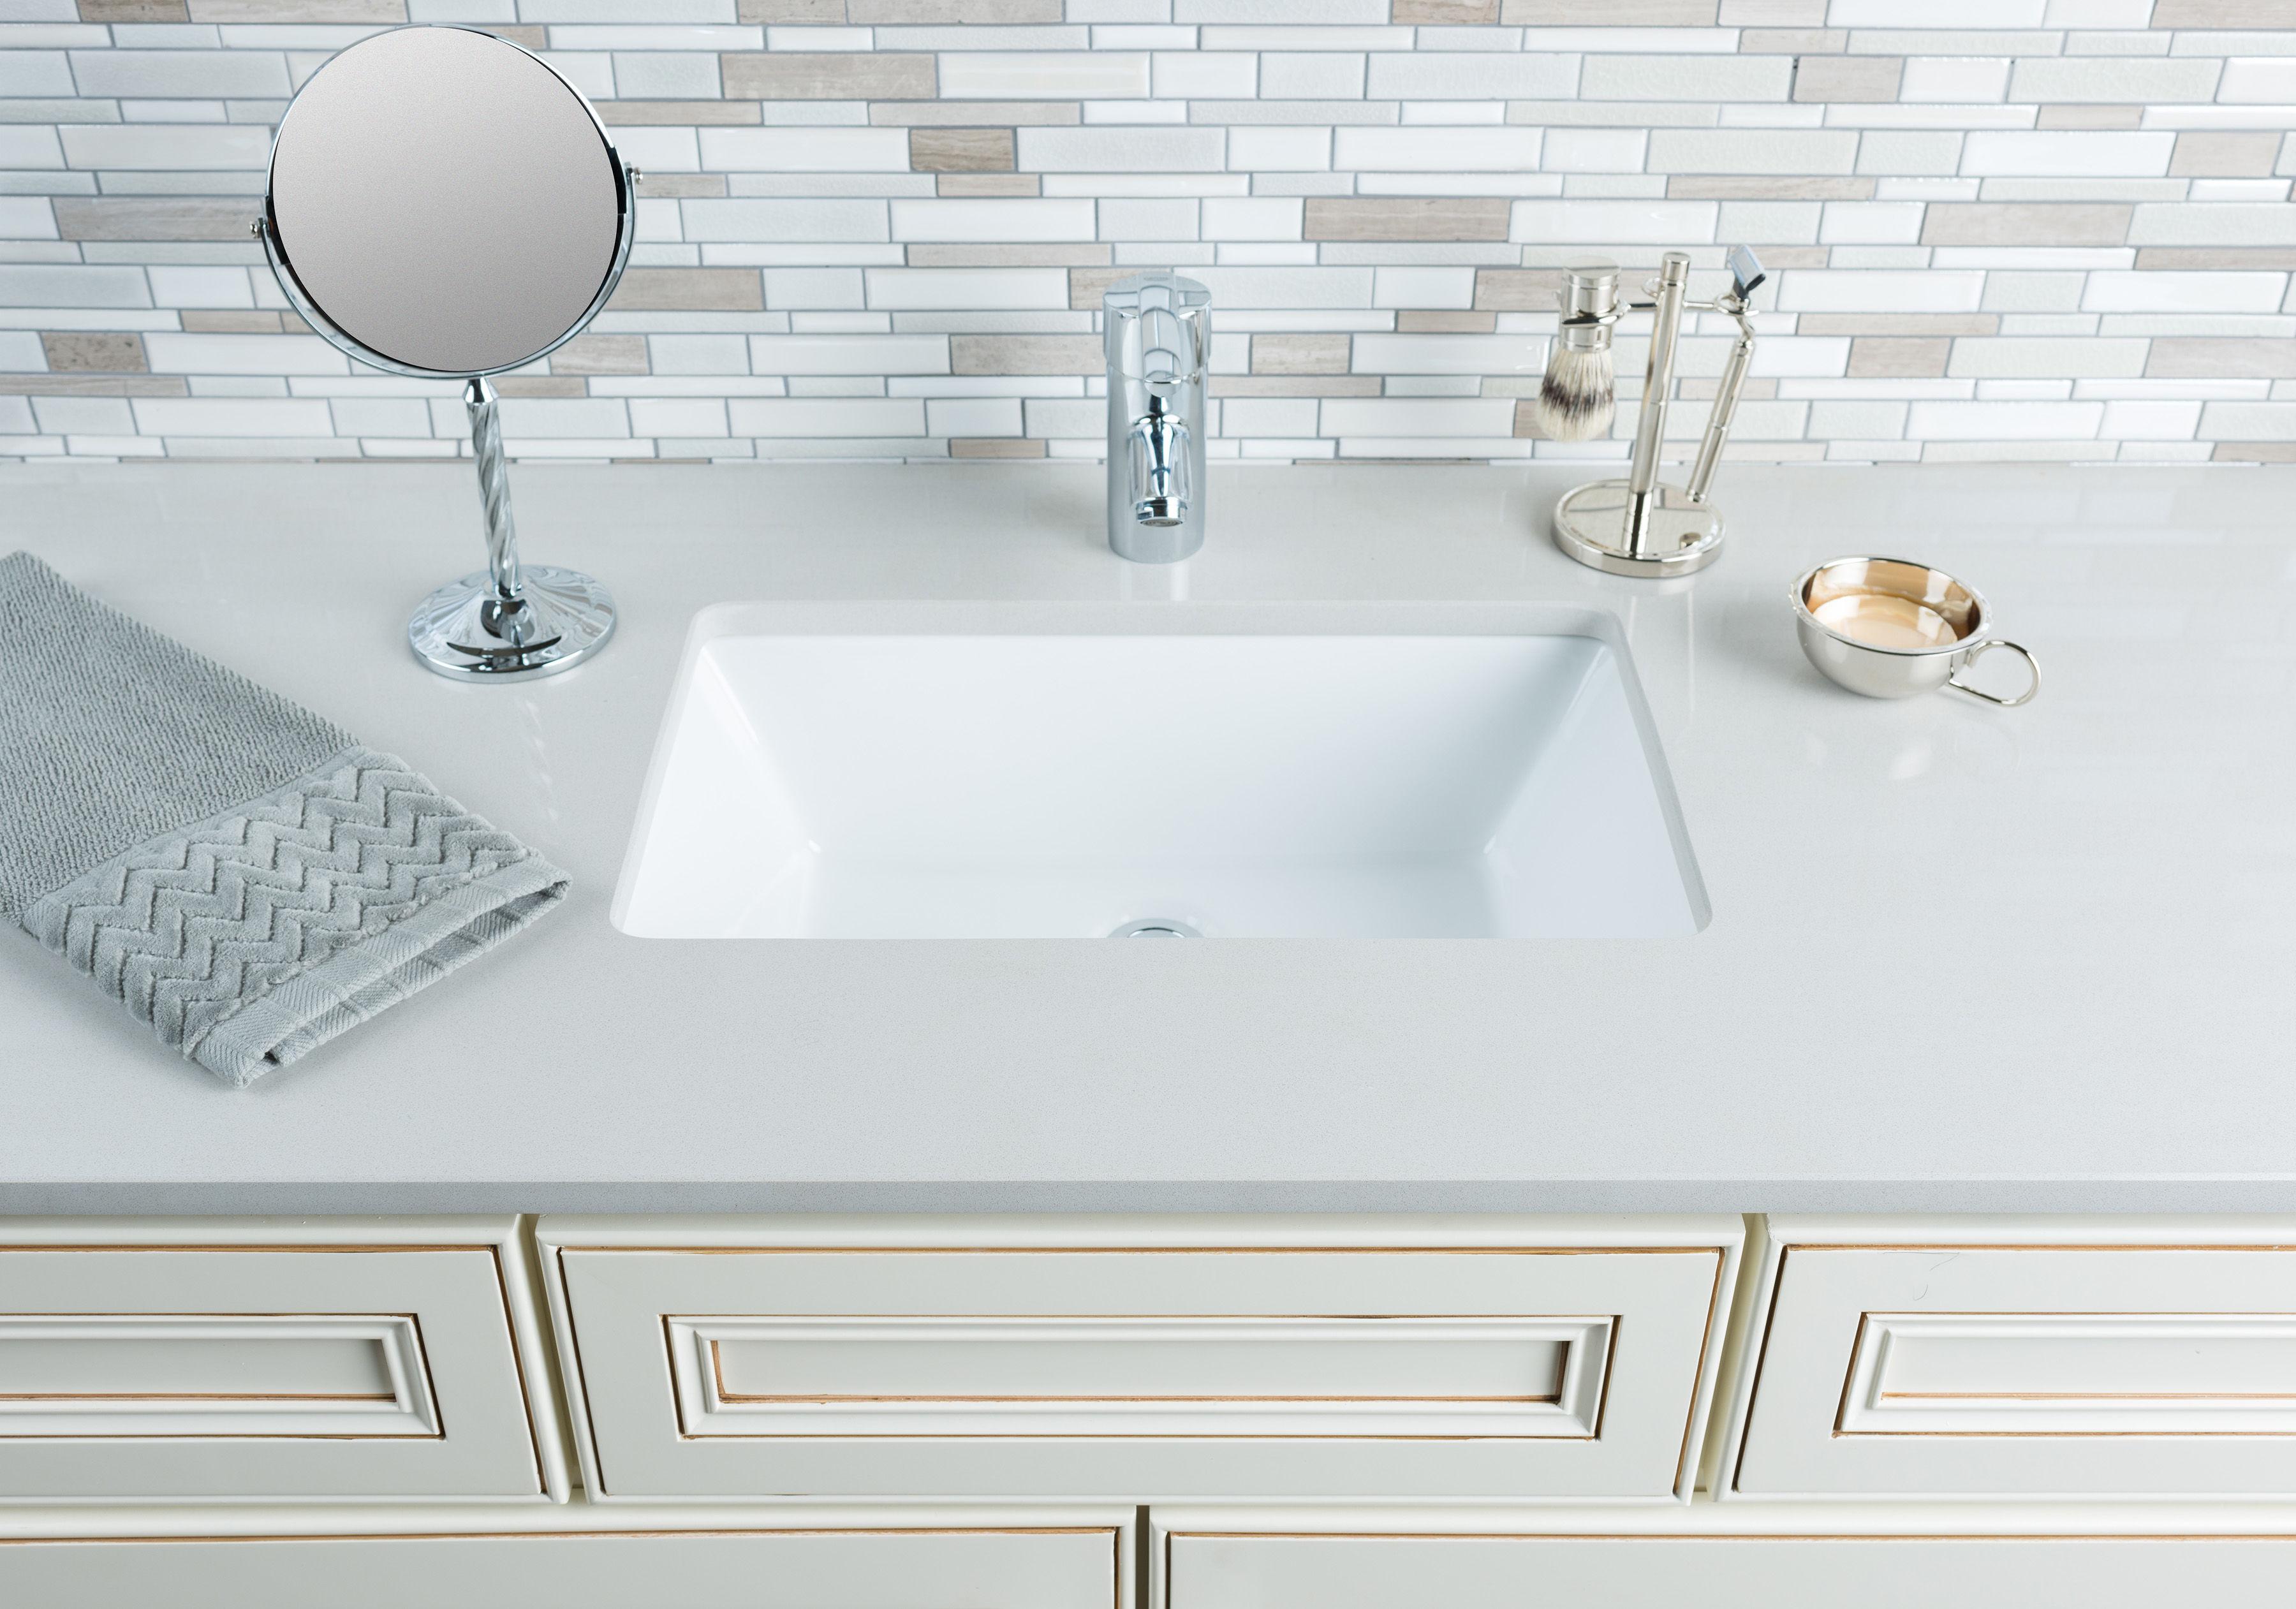 Undermount Rectangular Bathroom Sink miseno mno2113ru bathroom sink - build